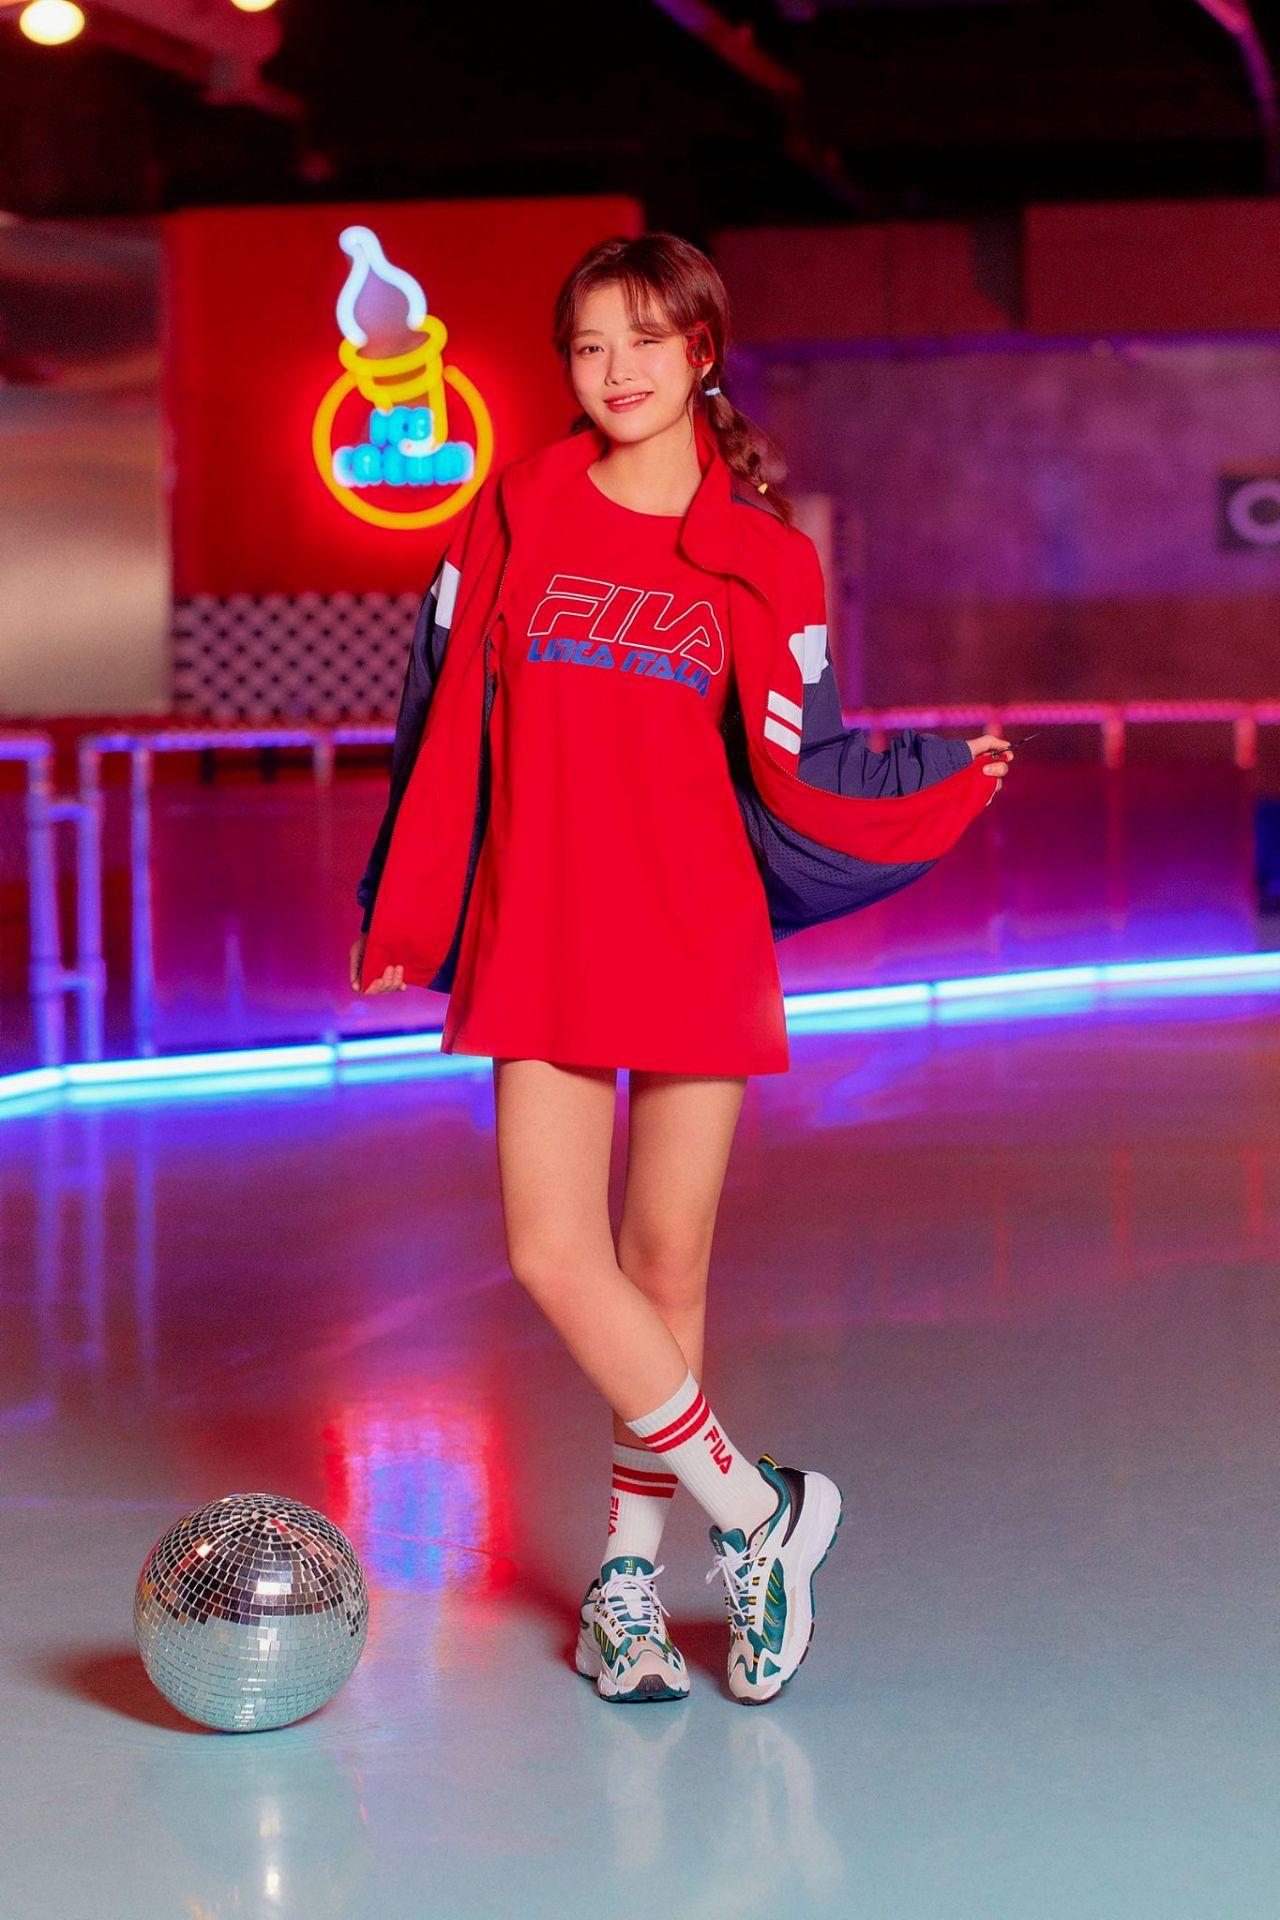 Kim Yoo Jung Style, Clothes, Outfits and Fashion • CelebMafia